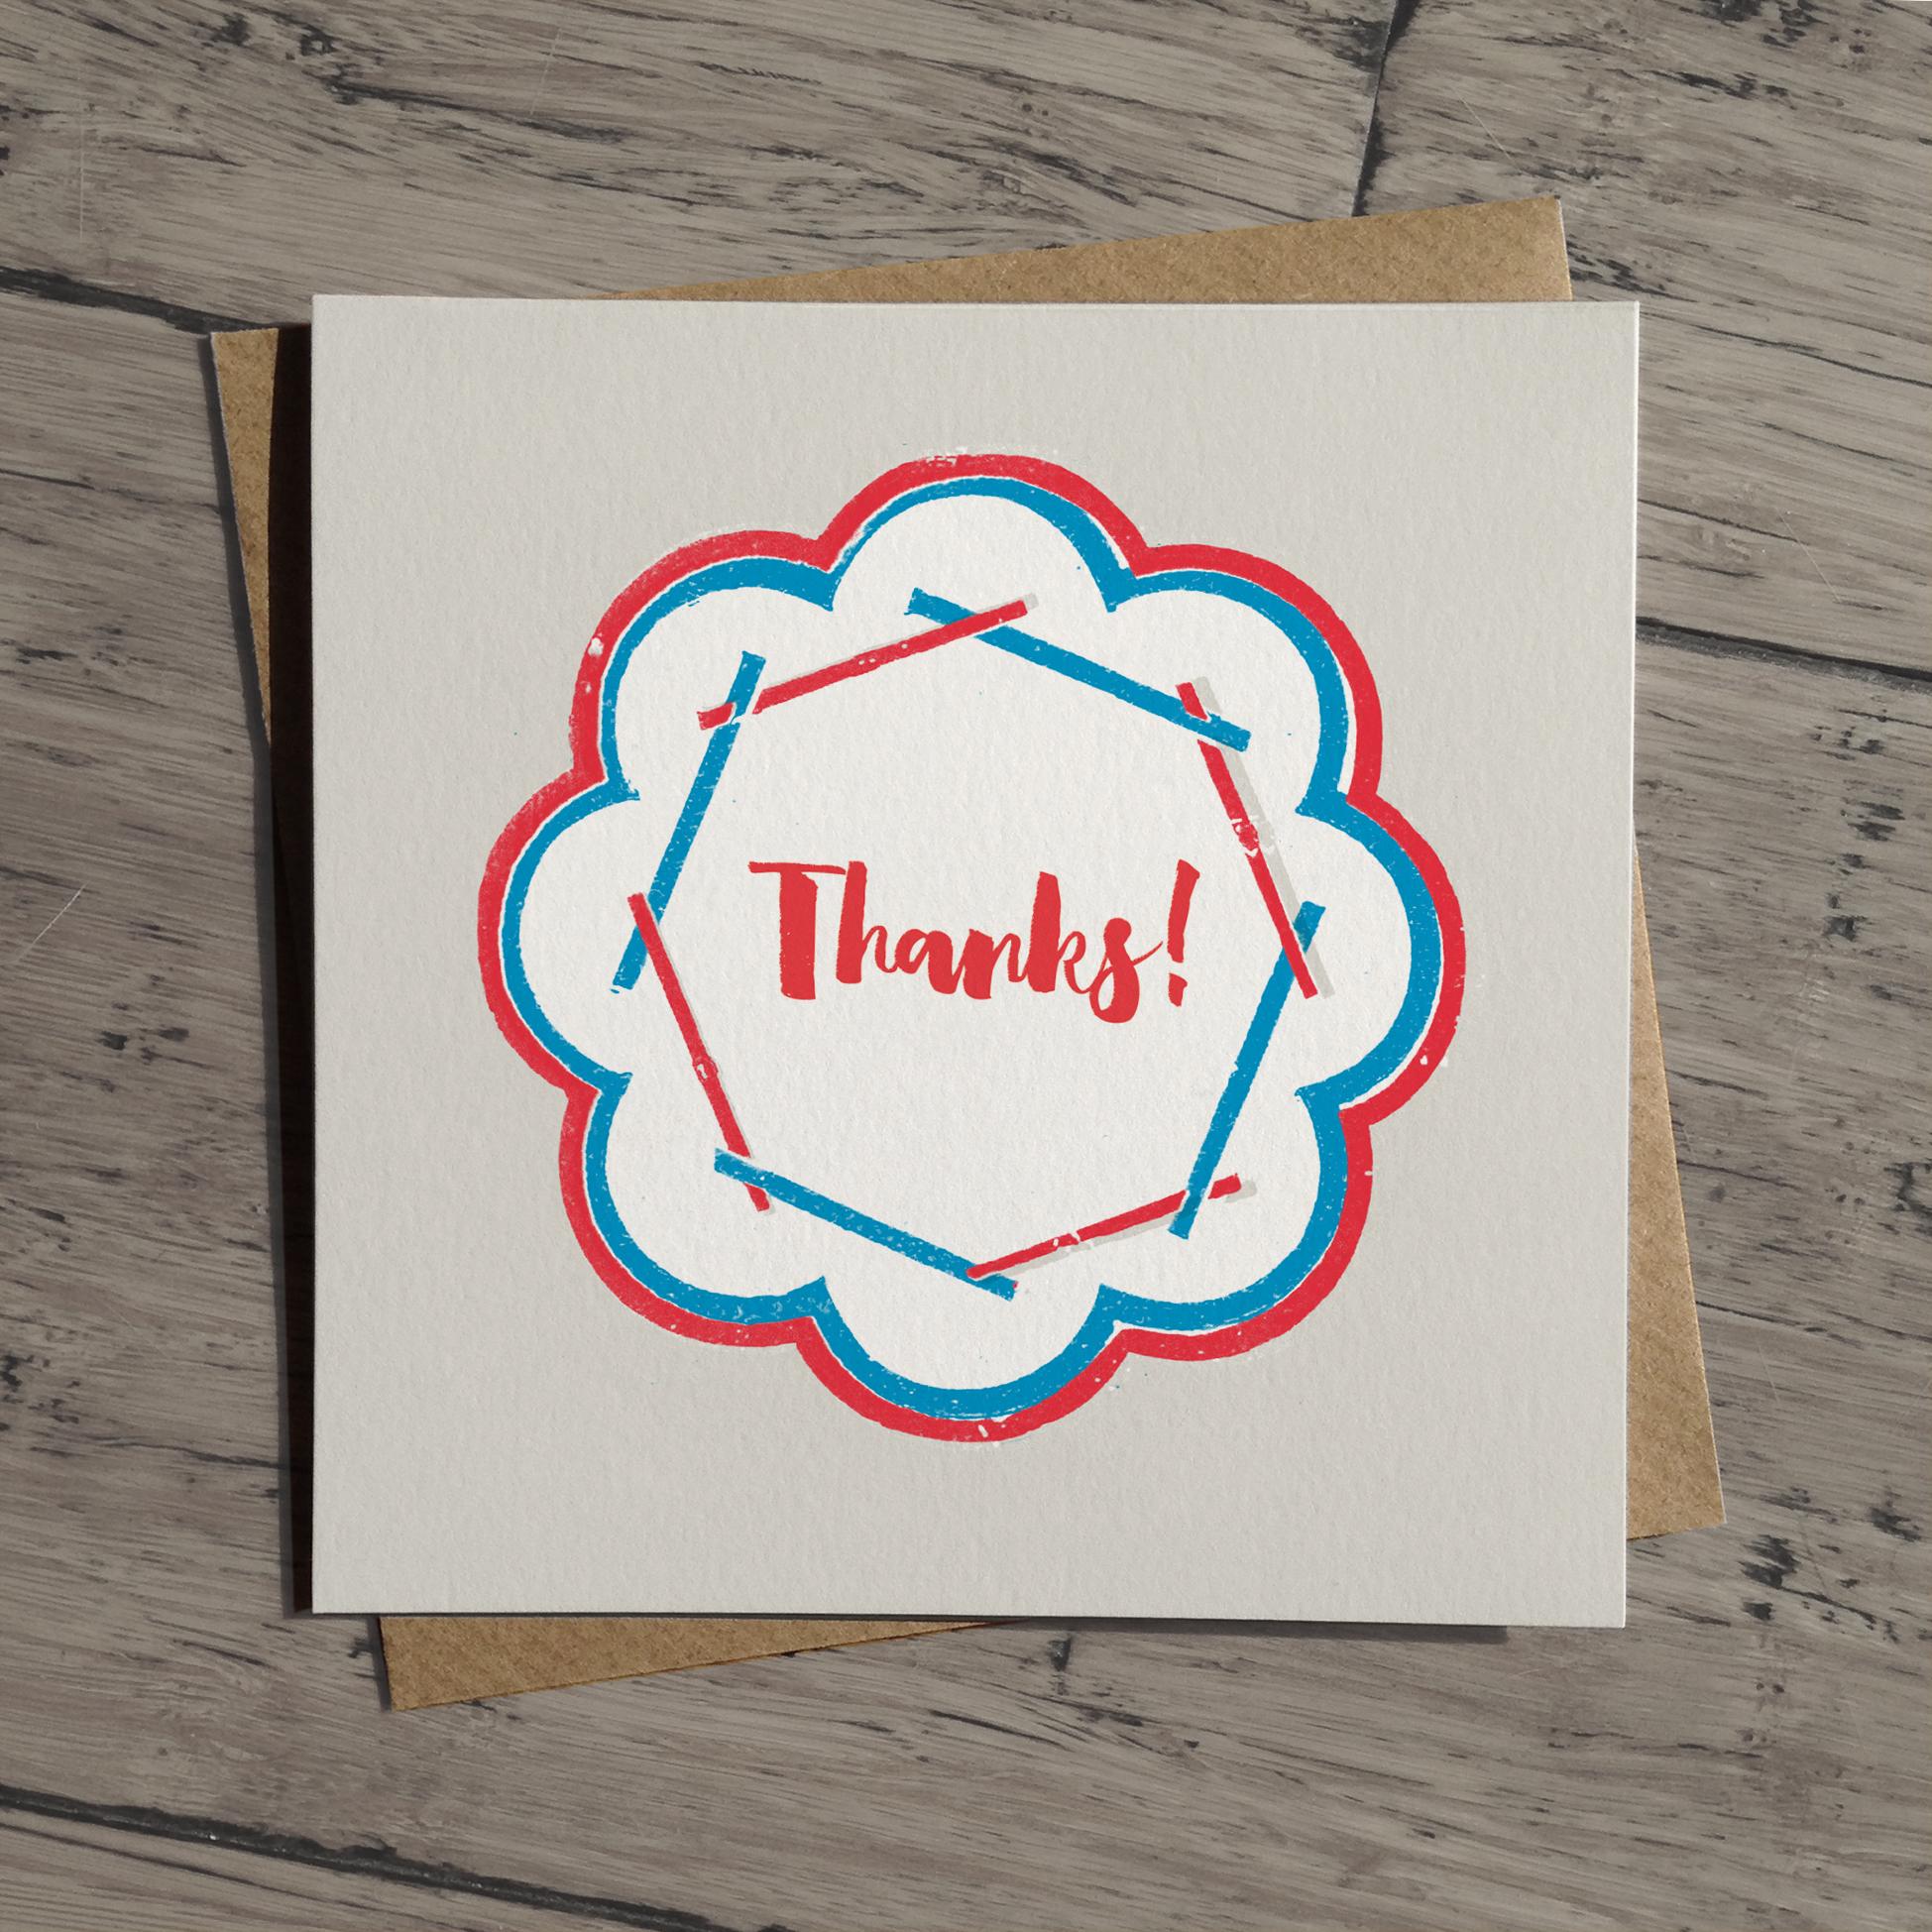 Thanks card: WW01